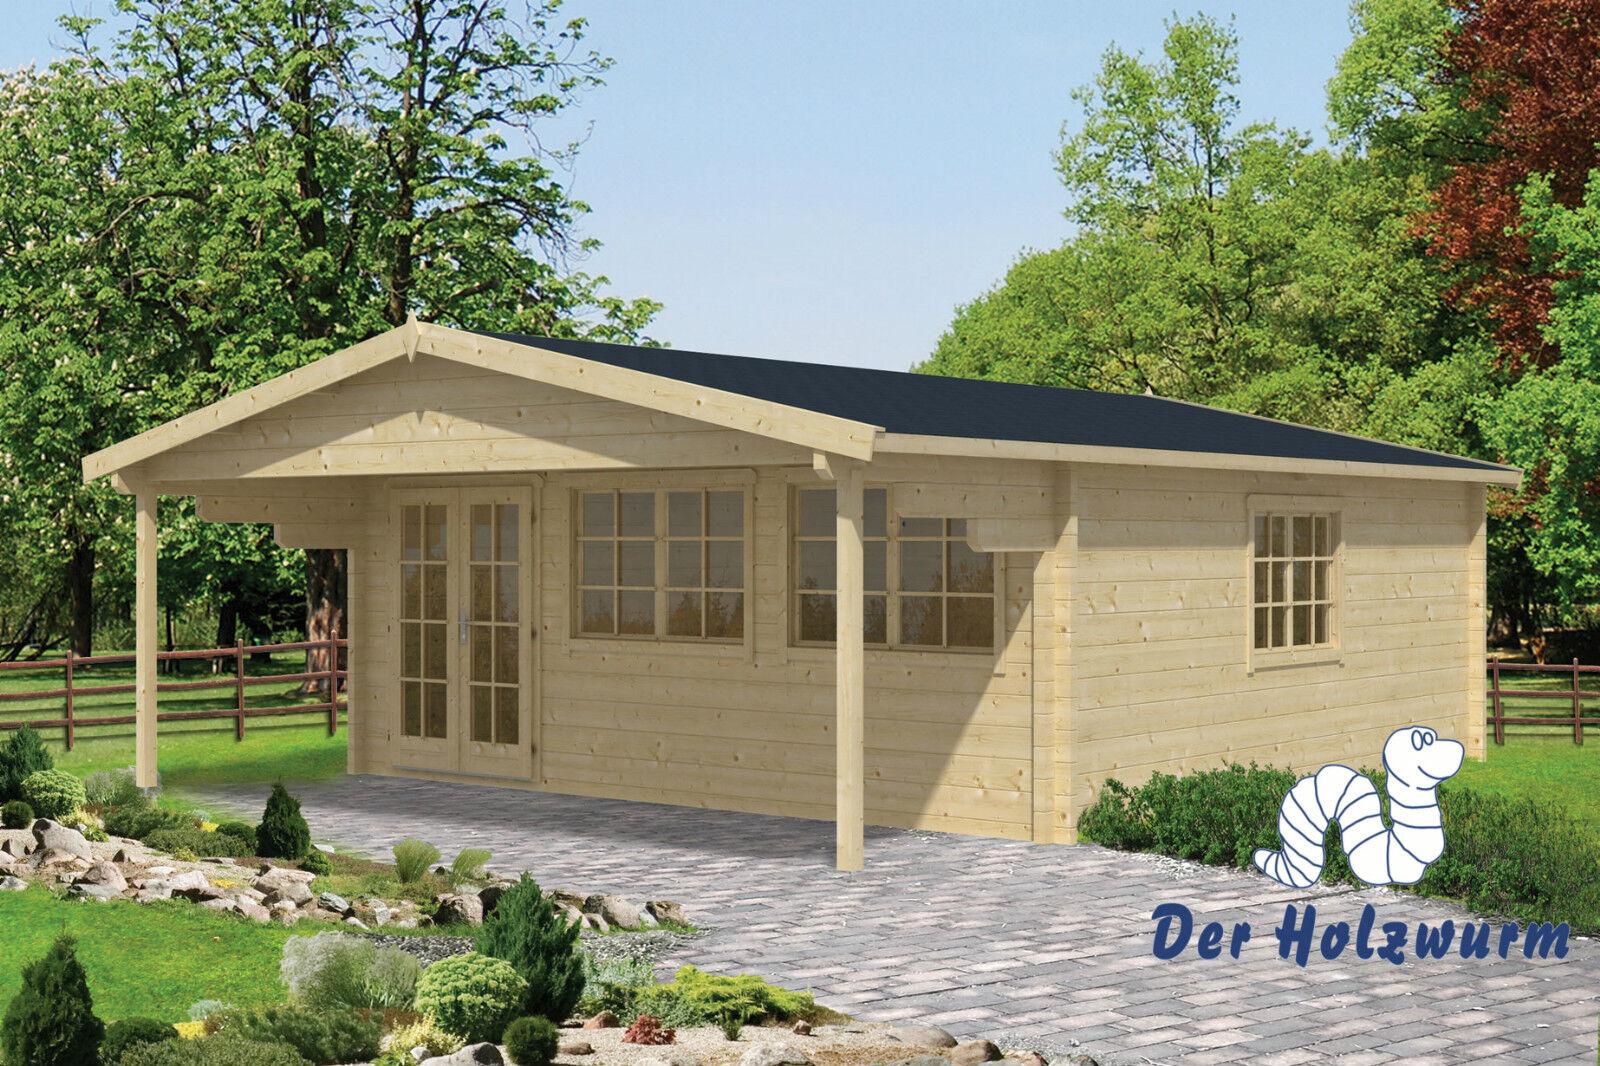 gartenhaus rune mit dachunterstand blockhaus 595x795cm holzhaus 70 mm holz neu ebay. Black Bedroom Furniture Sets. Home Design Ideas